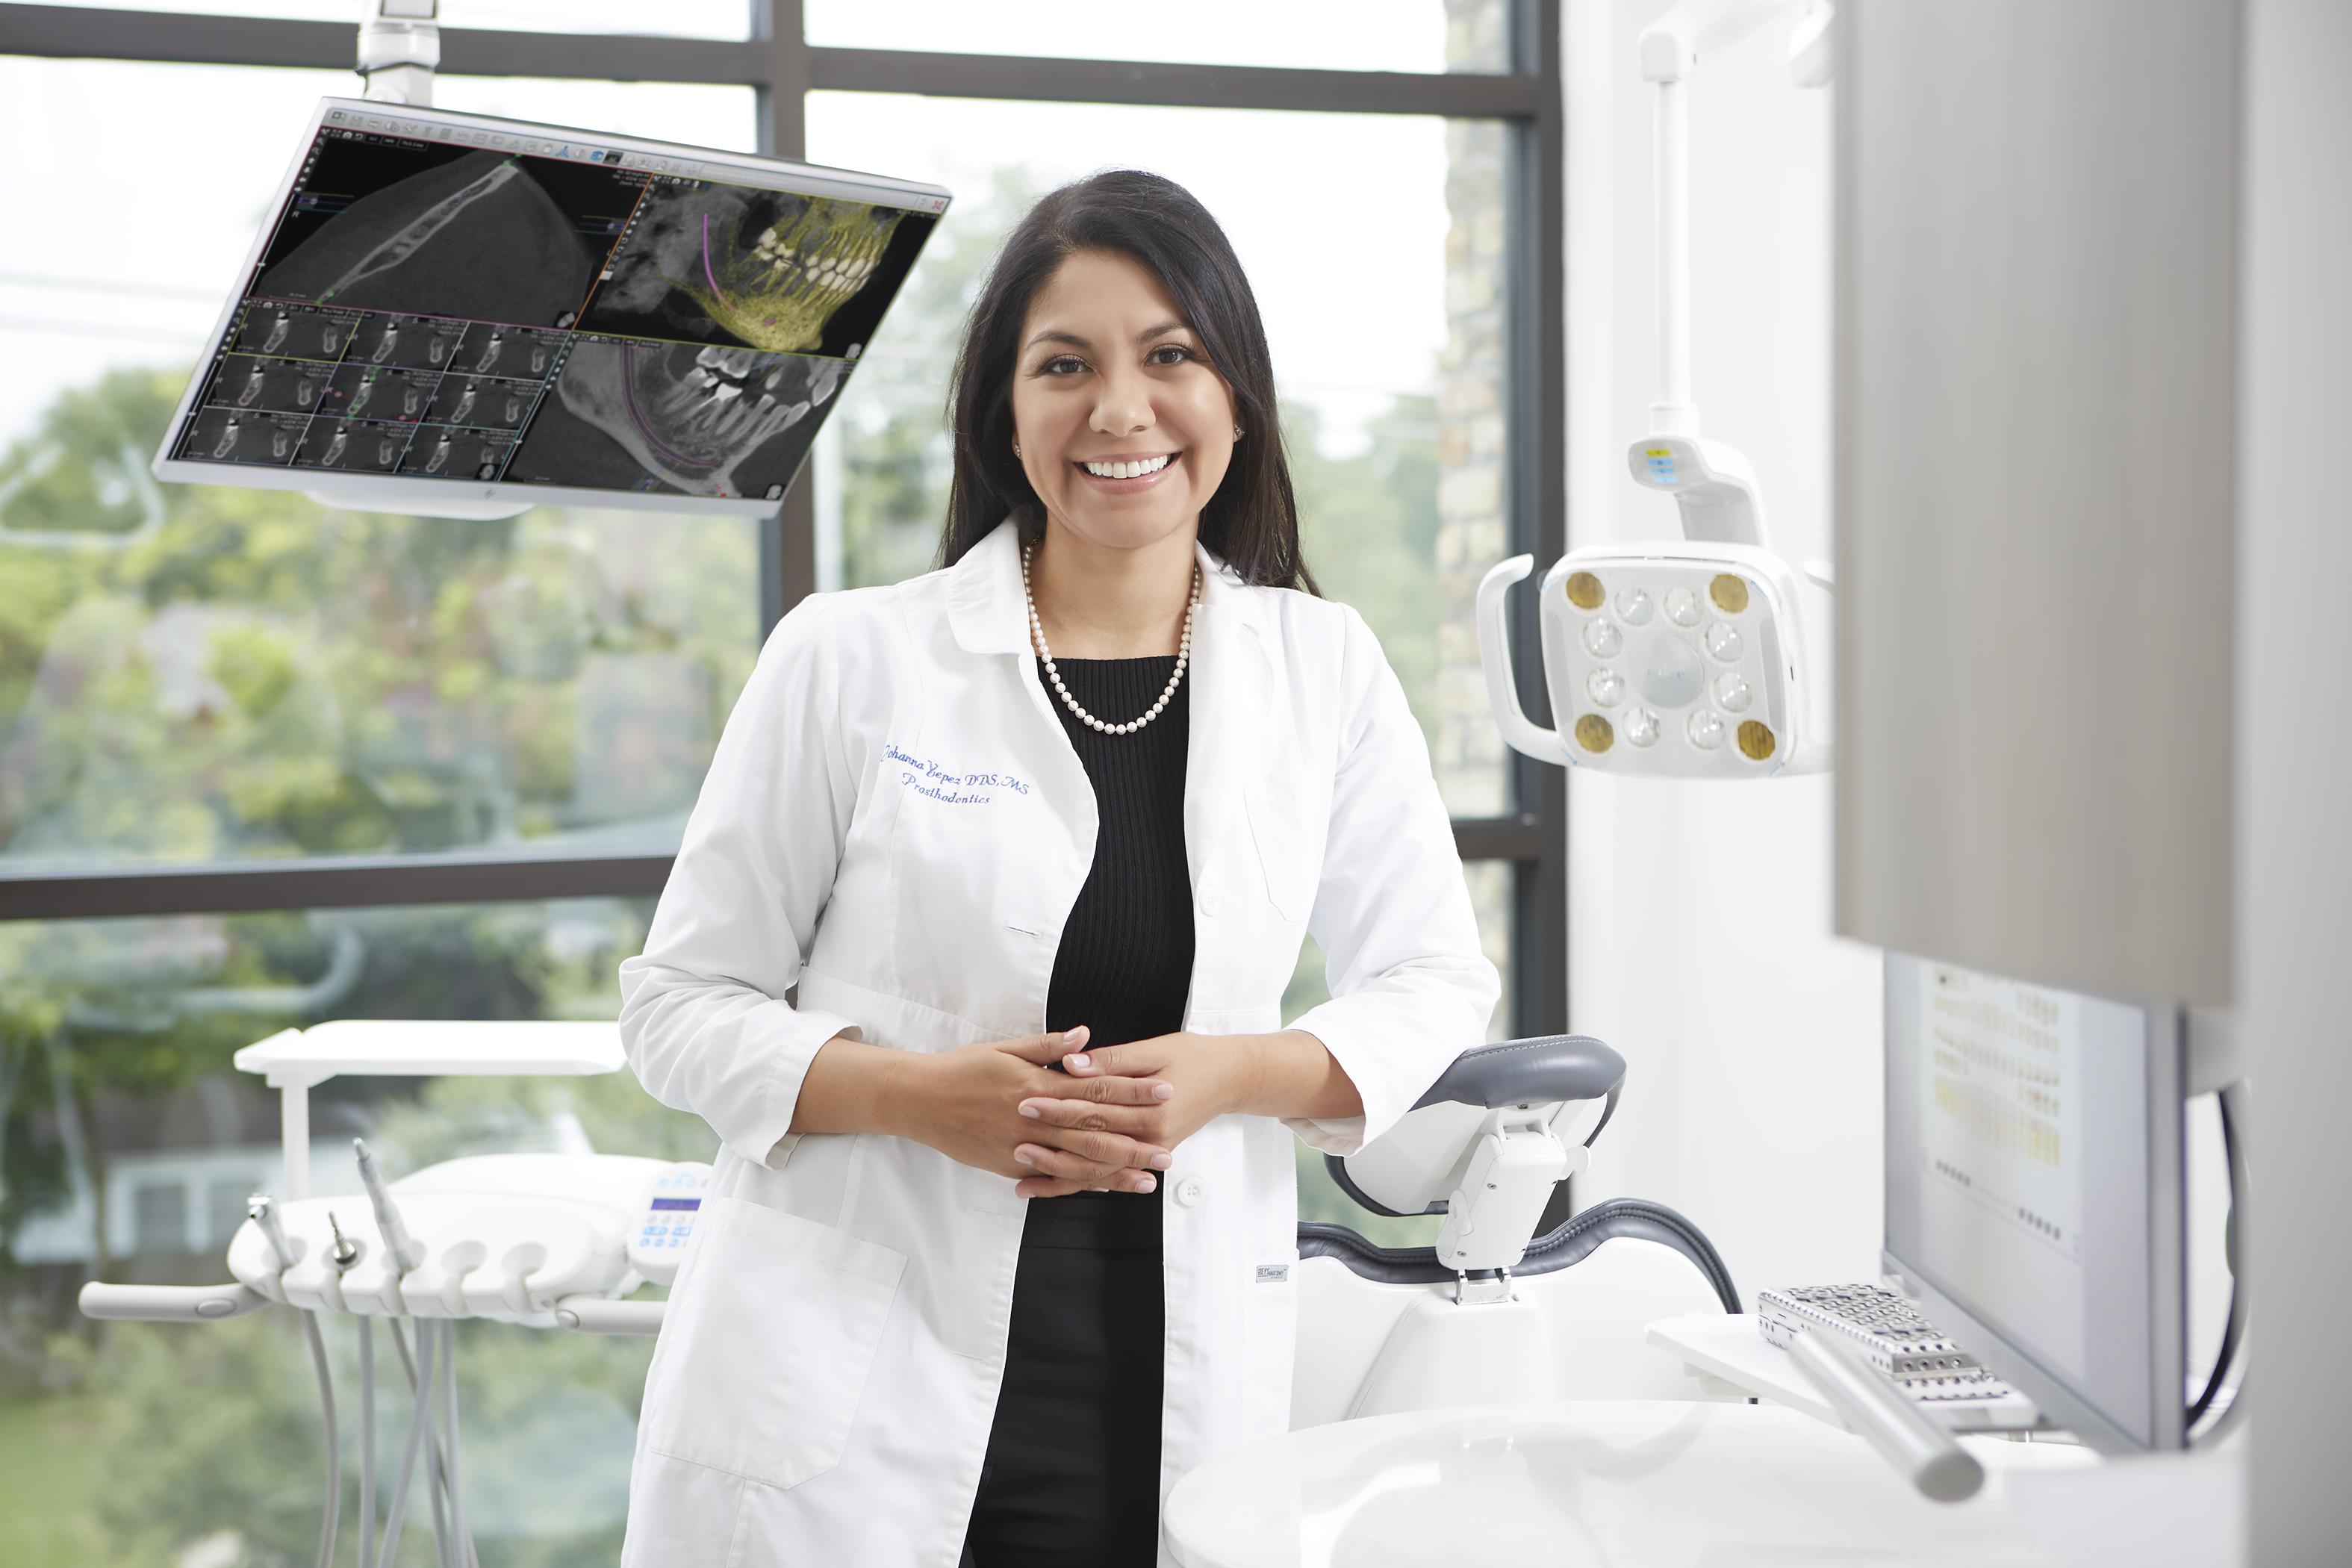 Start-Up Houston Prosthodontics Office Achieves Texas-Sized Goals